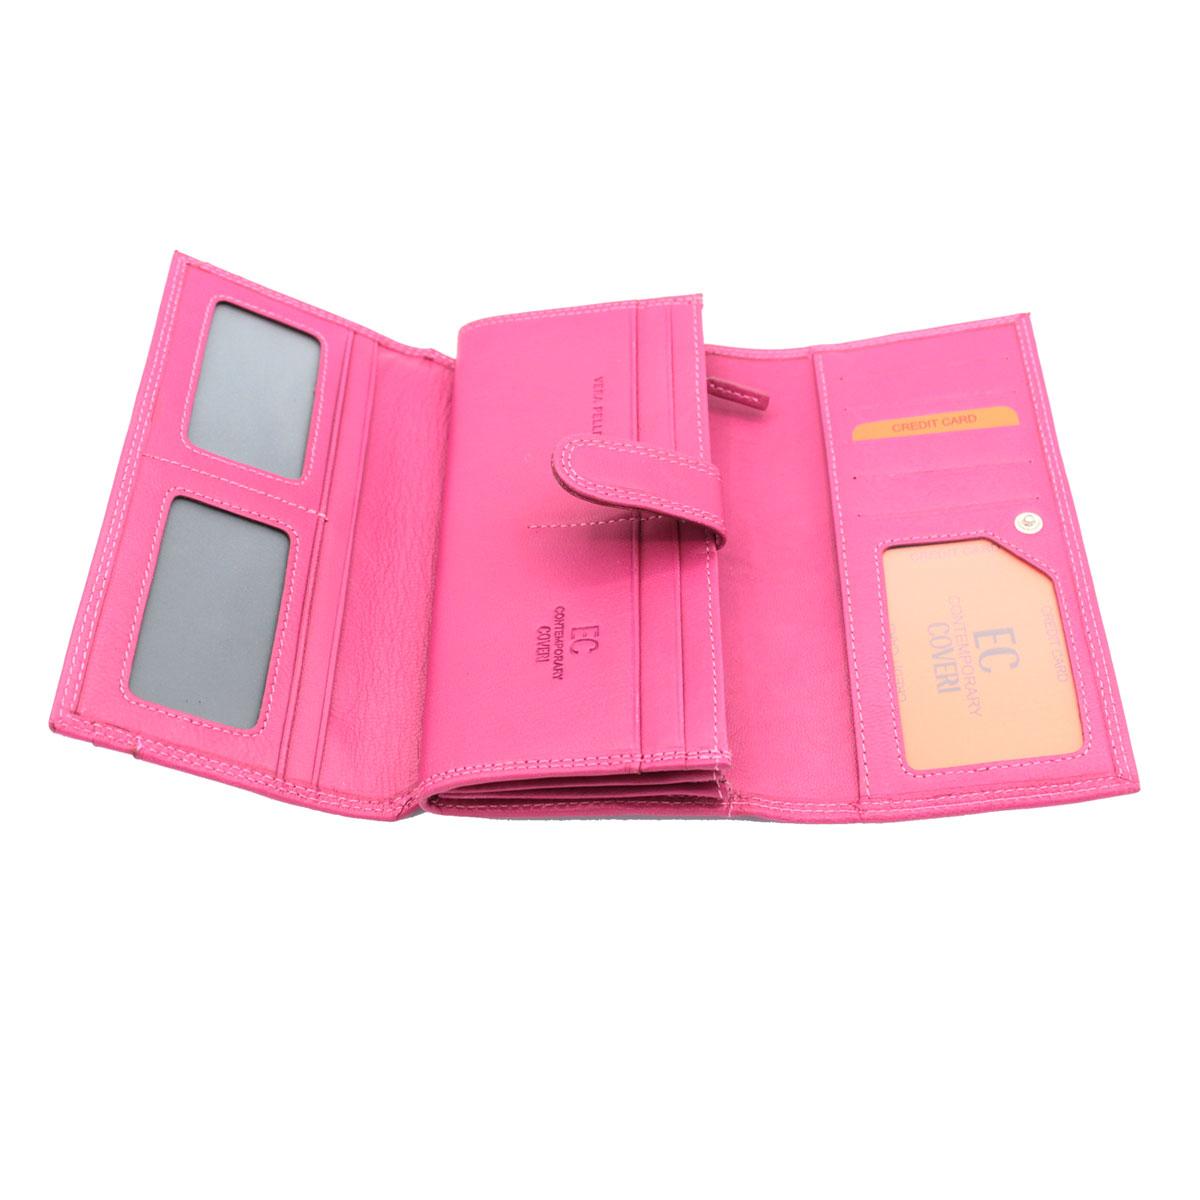 Portafoglio donna PELLE portamonete portafoto CONTEMPORARY COVERI 830-G105 aranc